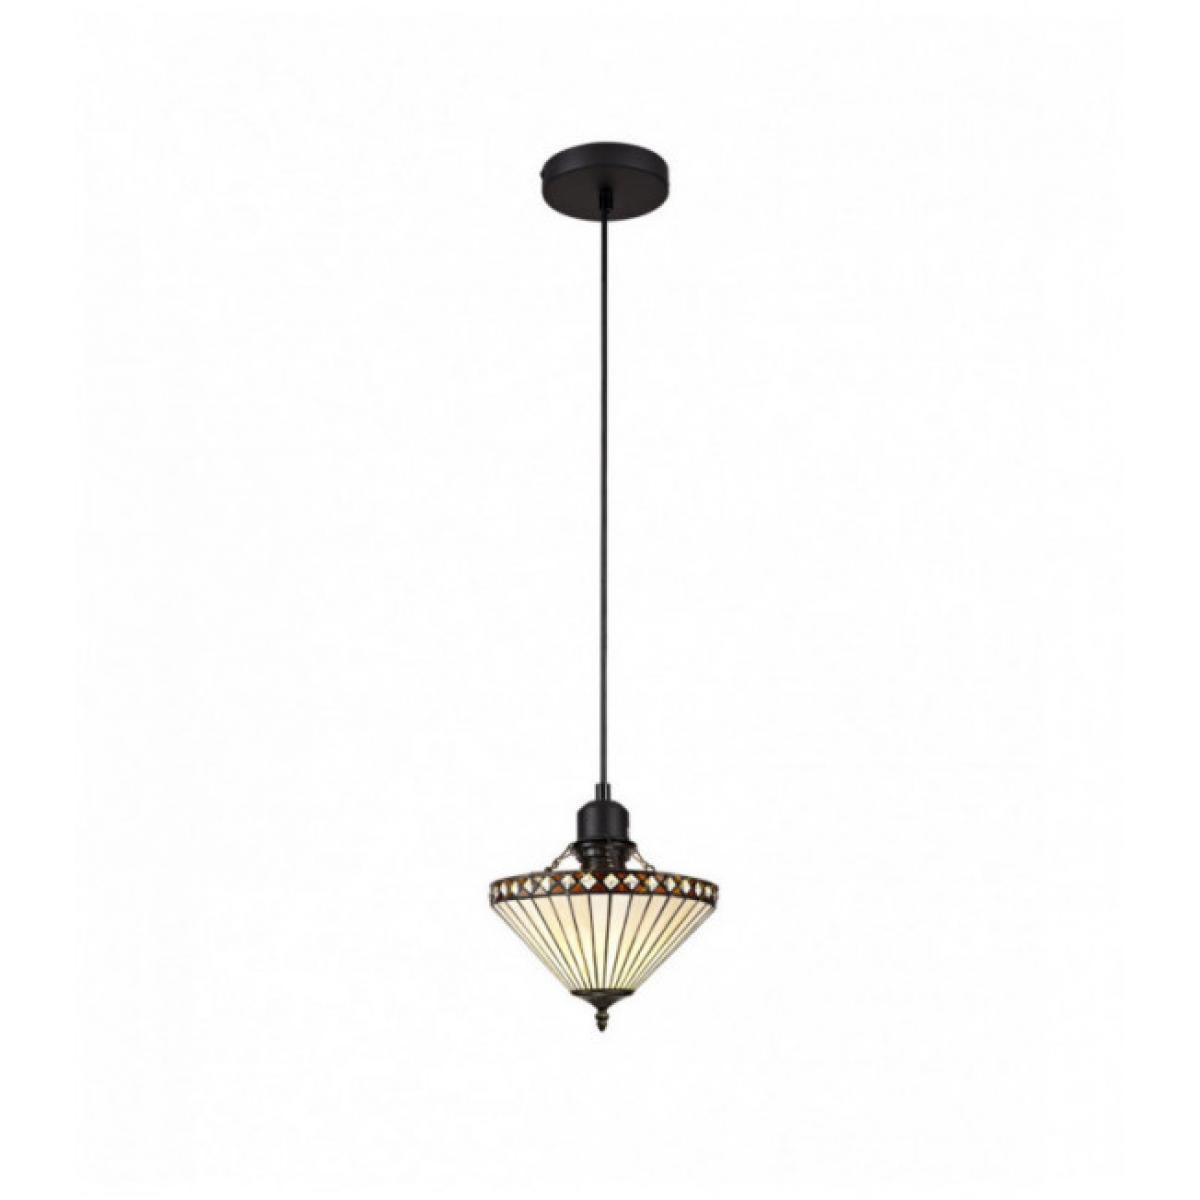 Luminaire Center Suspension Tiffany Carole 1 Ampoule Ambre 17 Cm